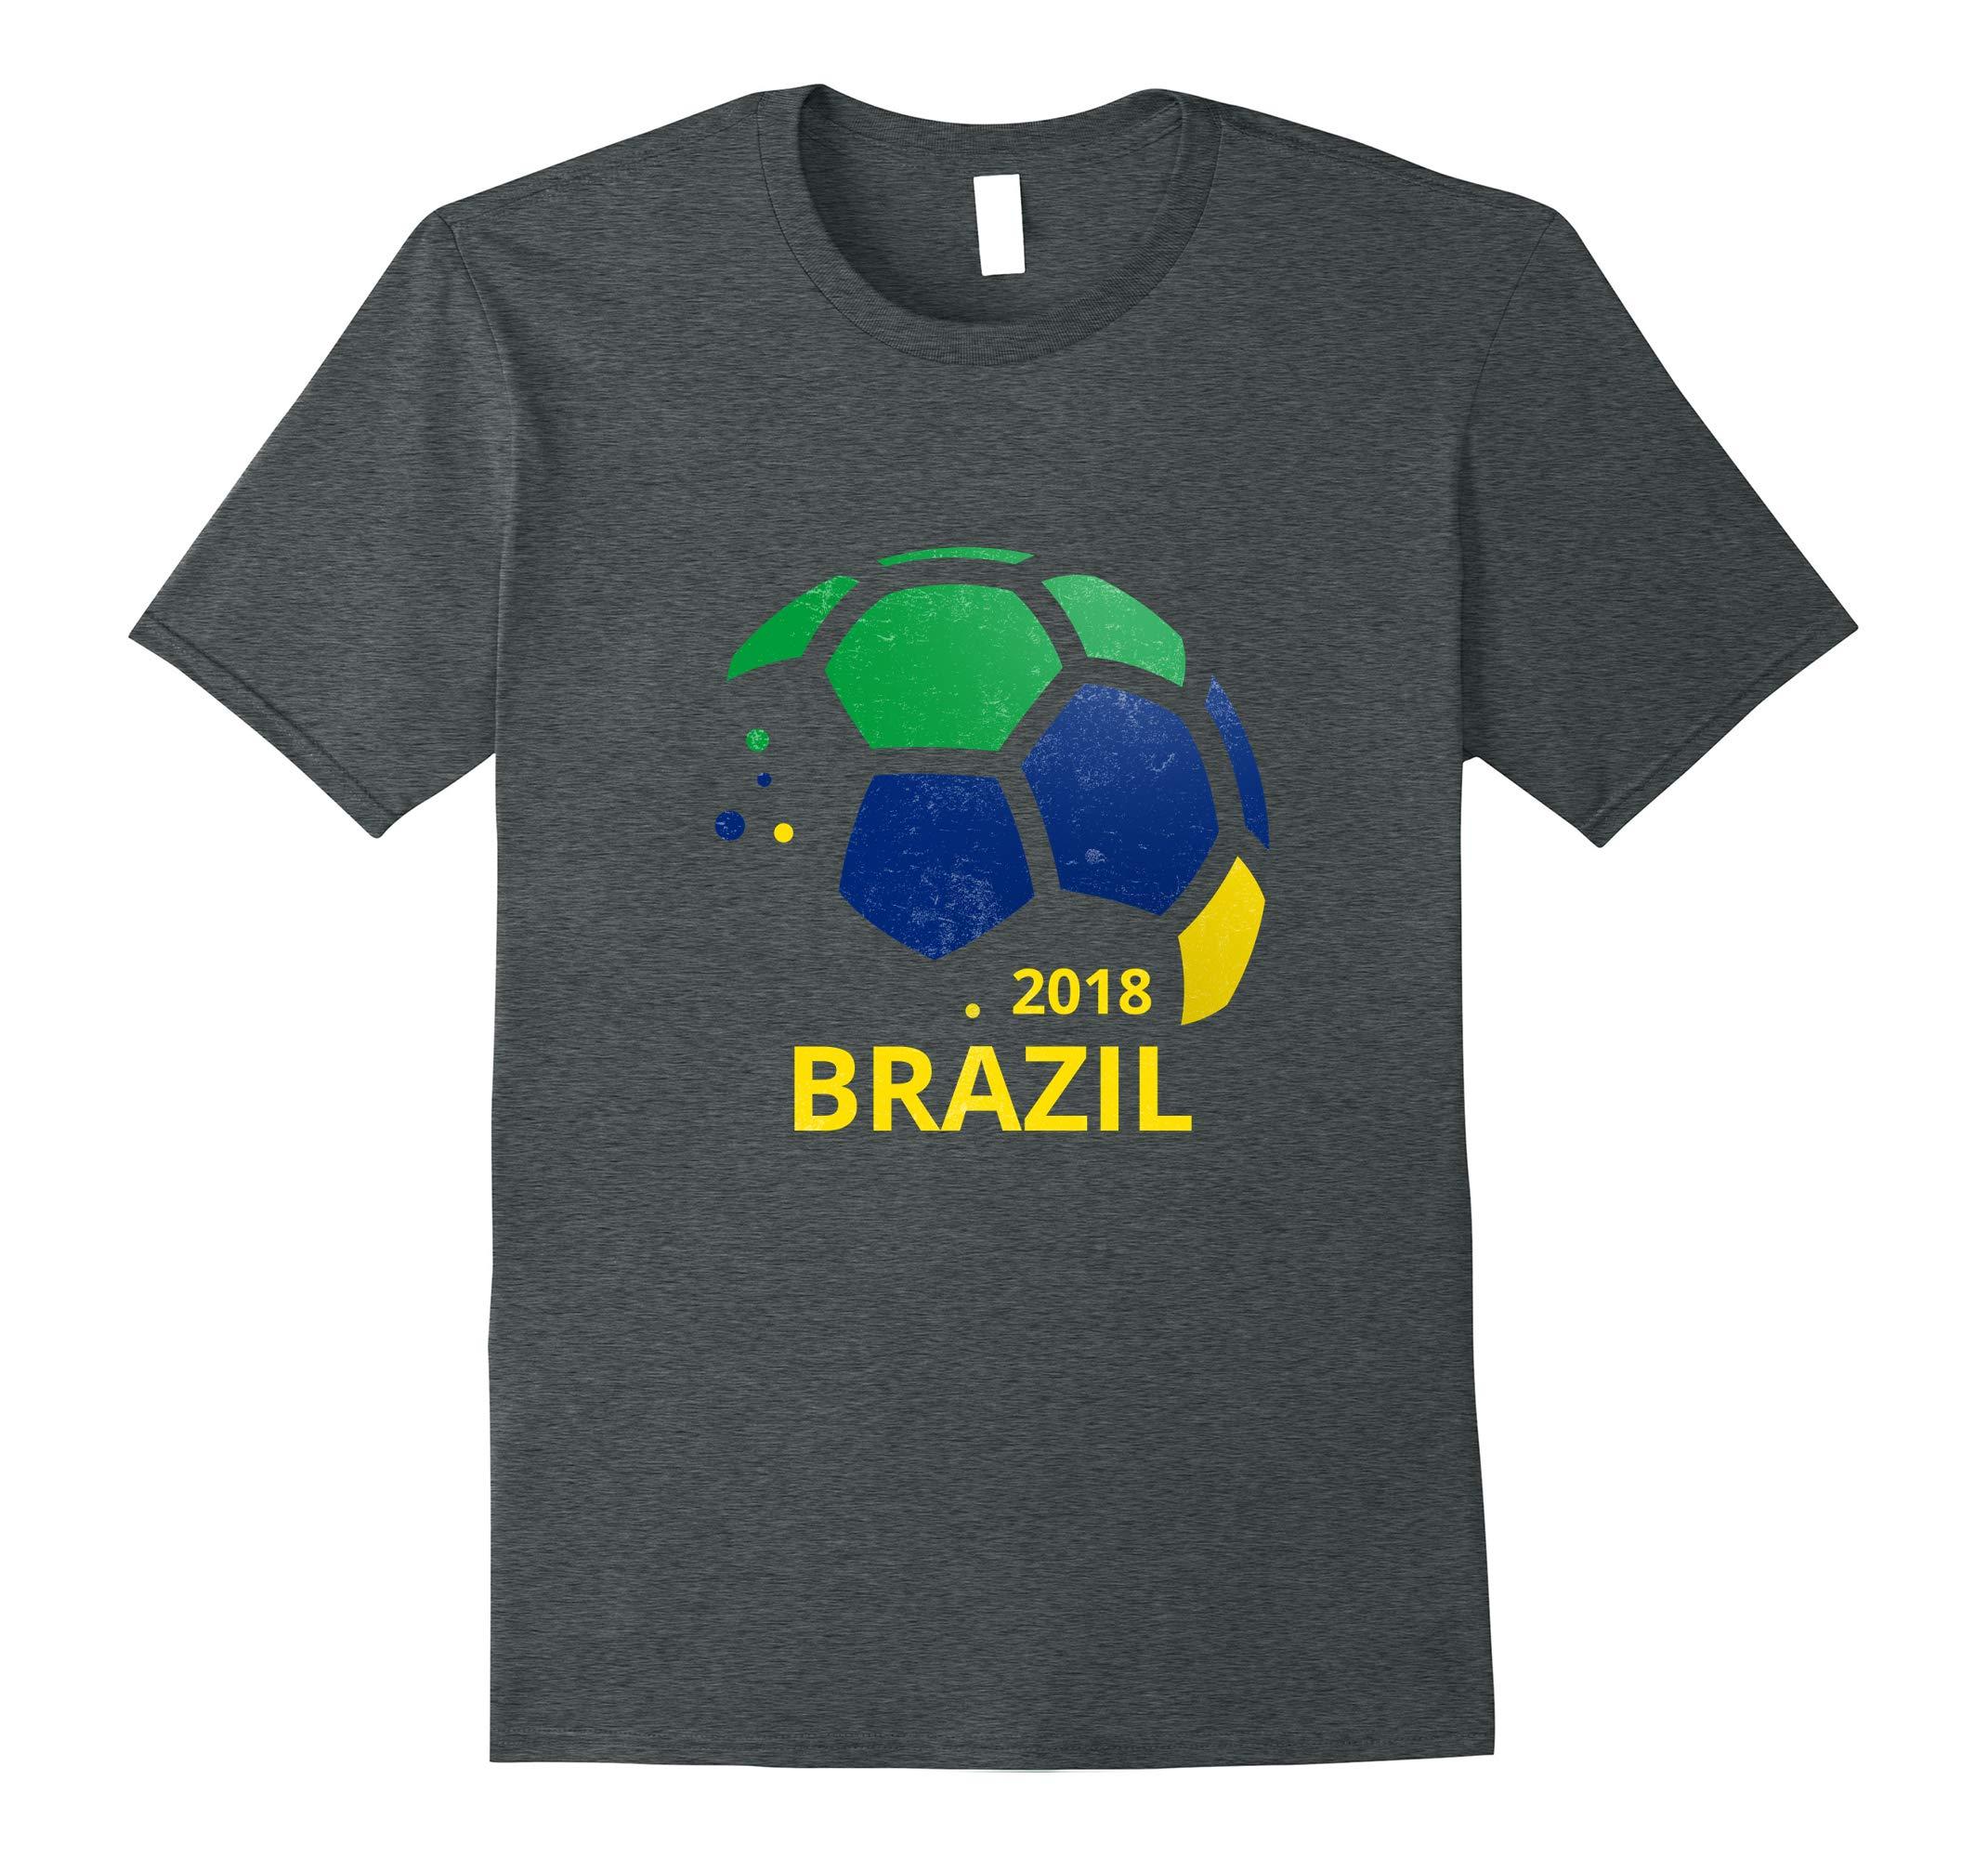 Brazil Fan Pride Soccer Top Clothing Adult Teens Kids-RT